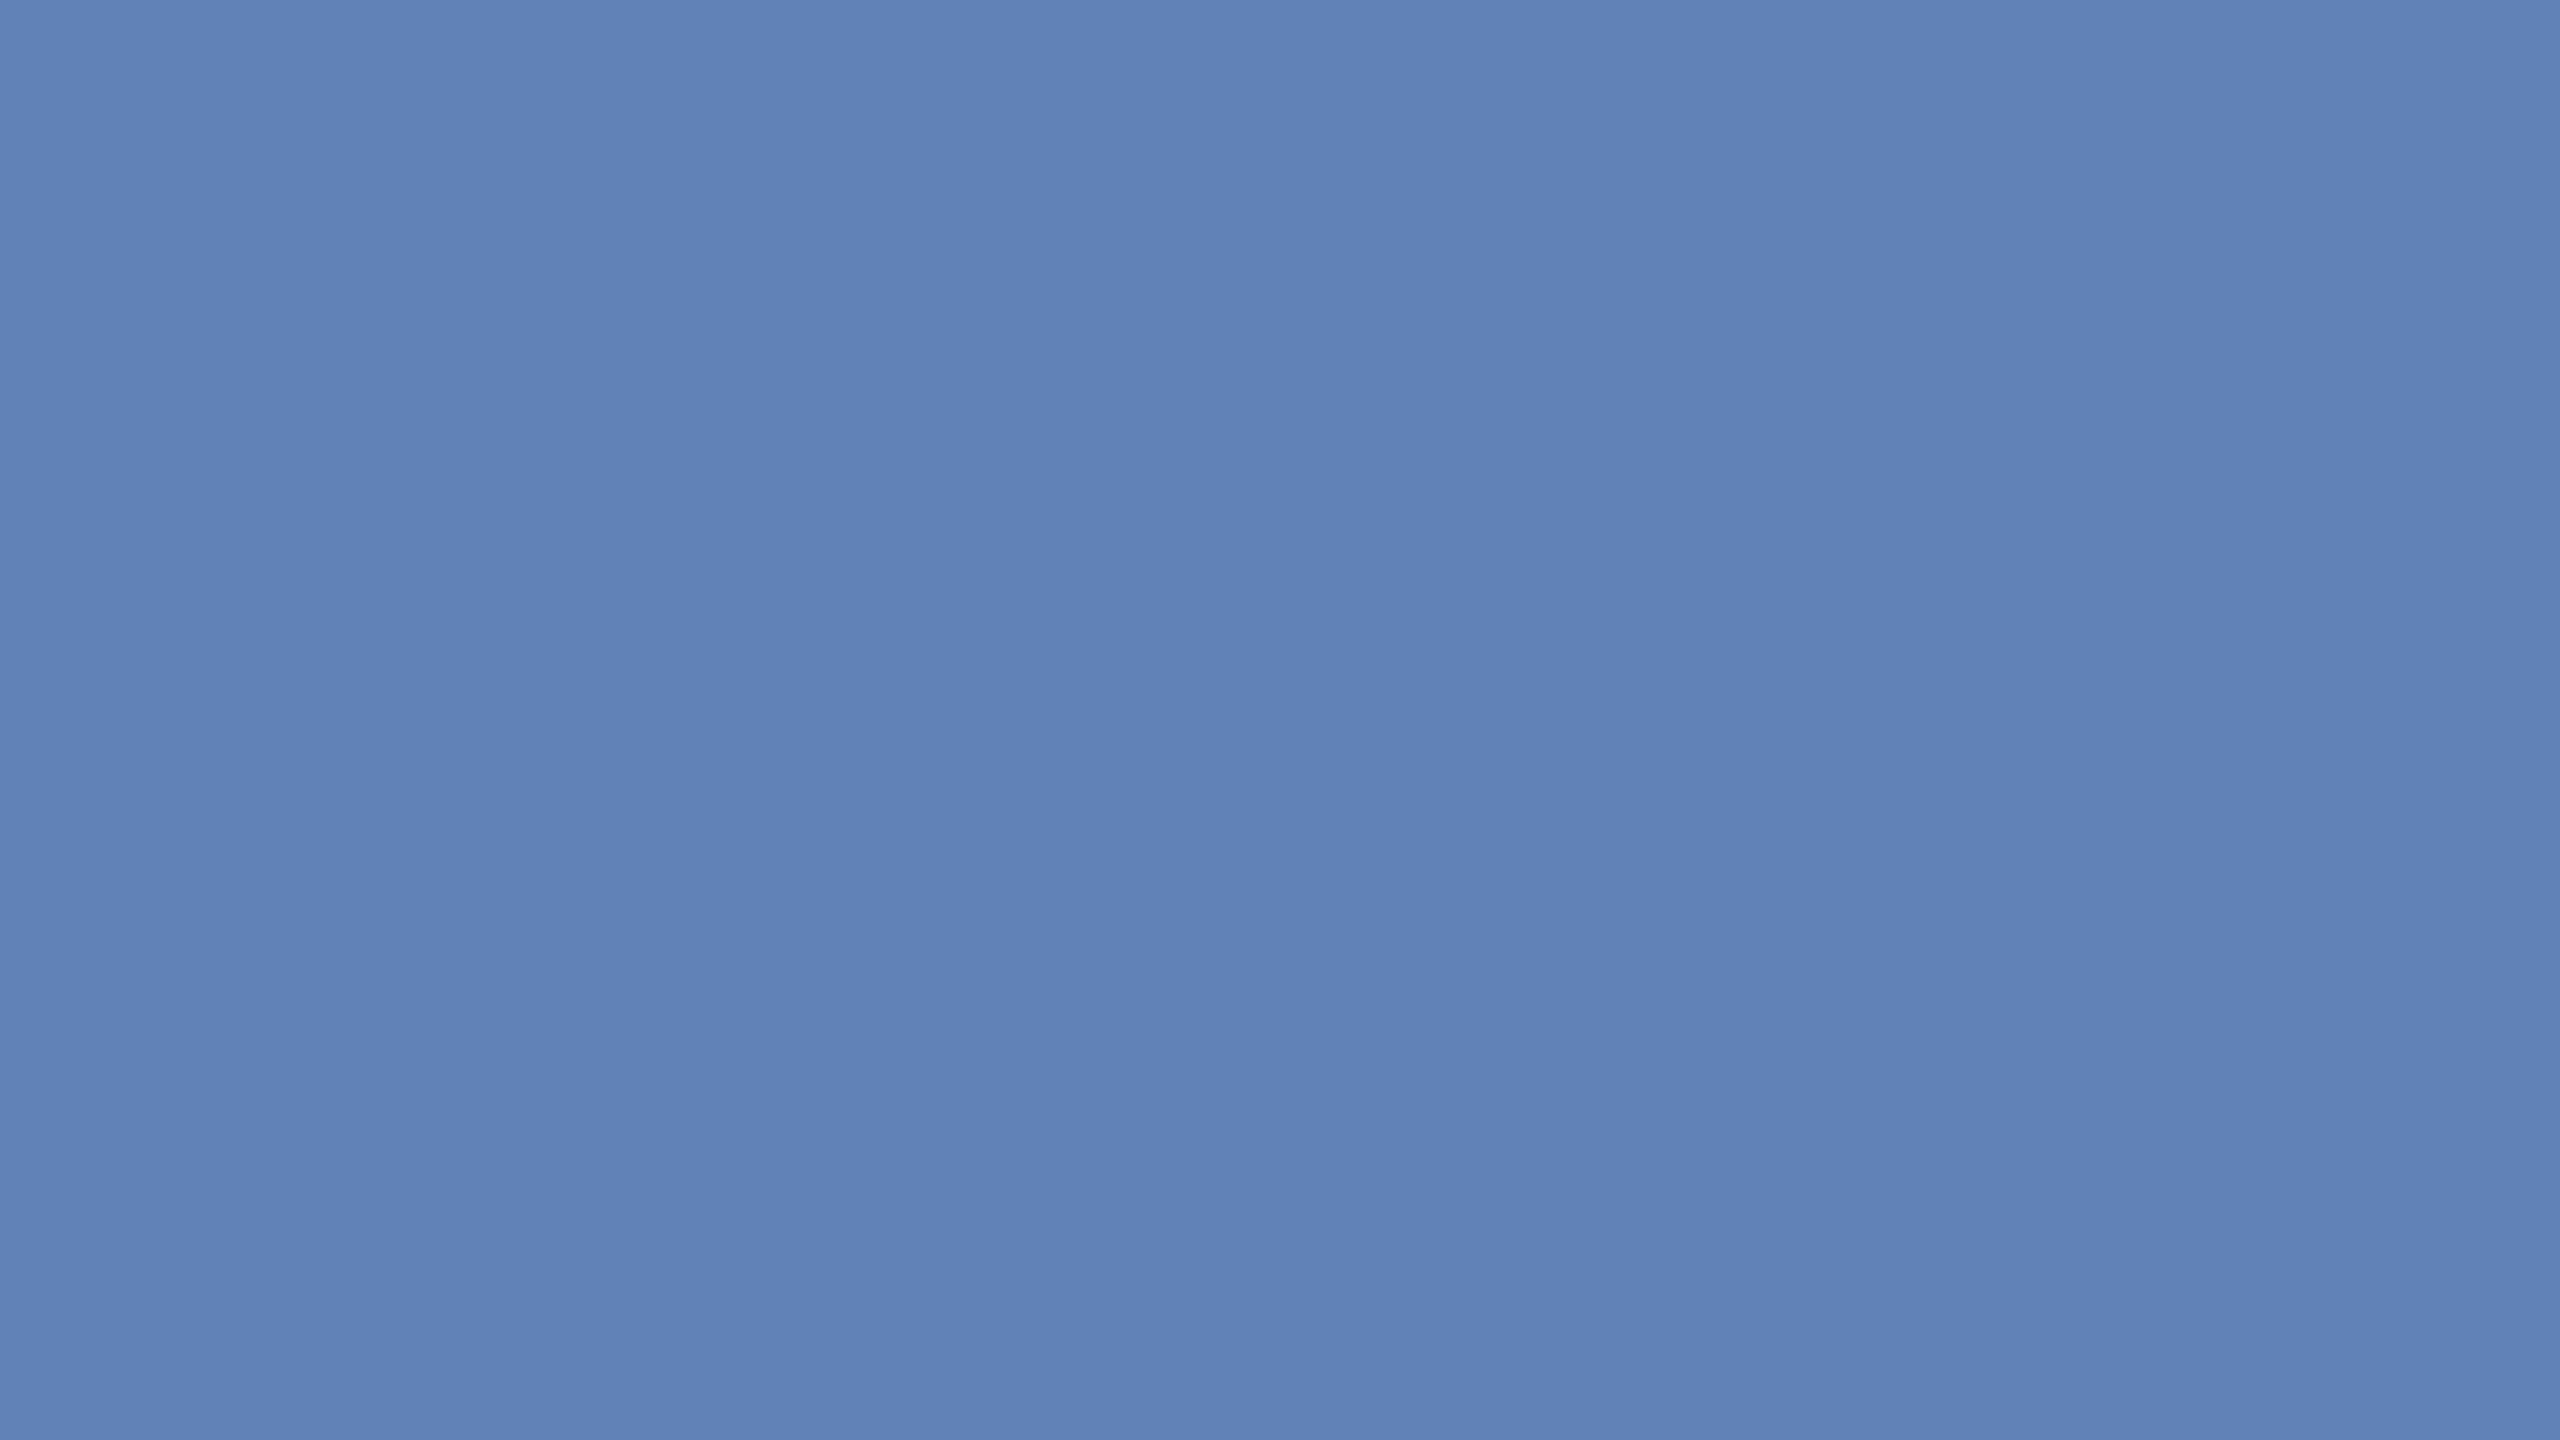 2560x1440 Glaucous Solid Color Background